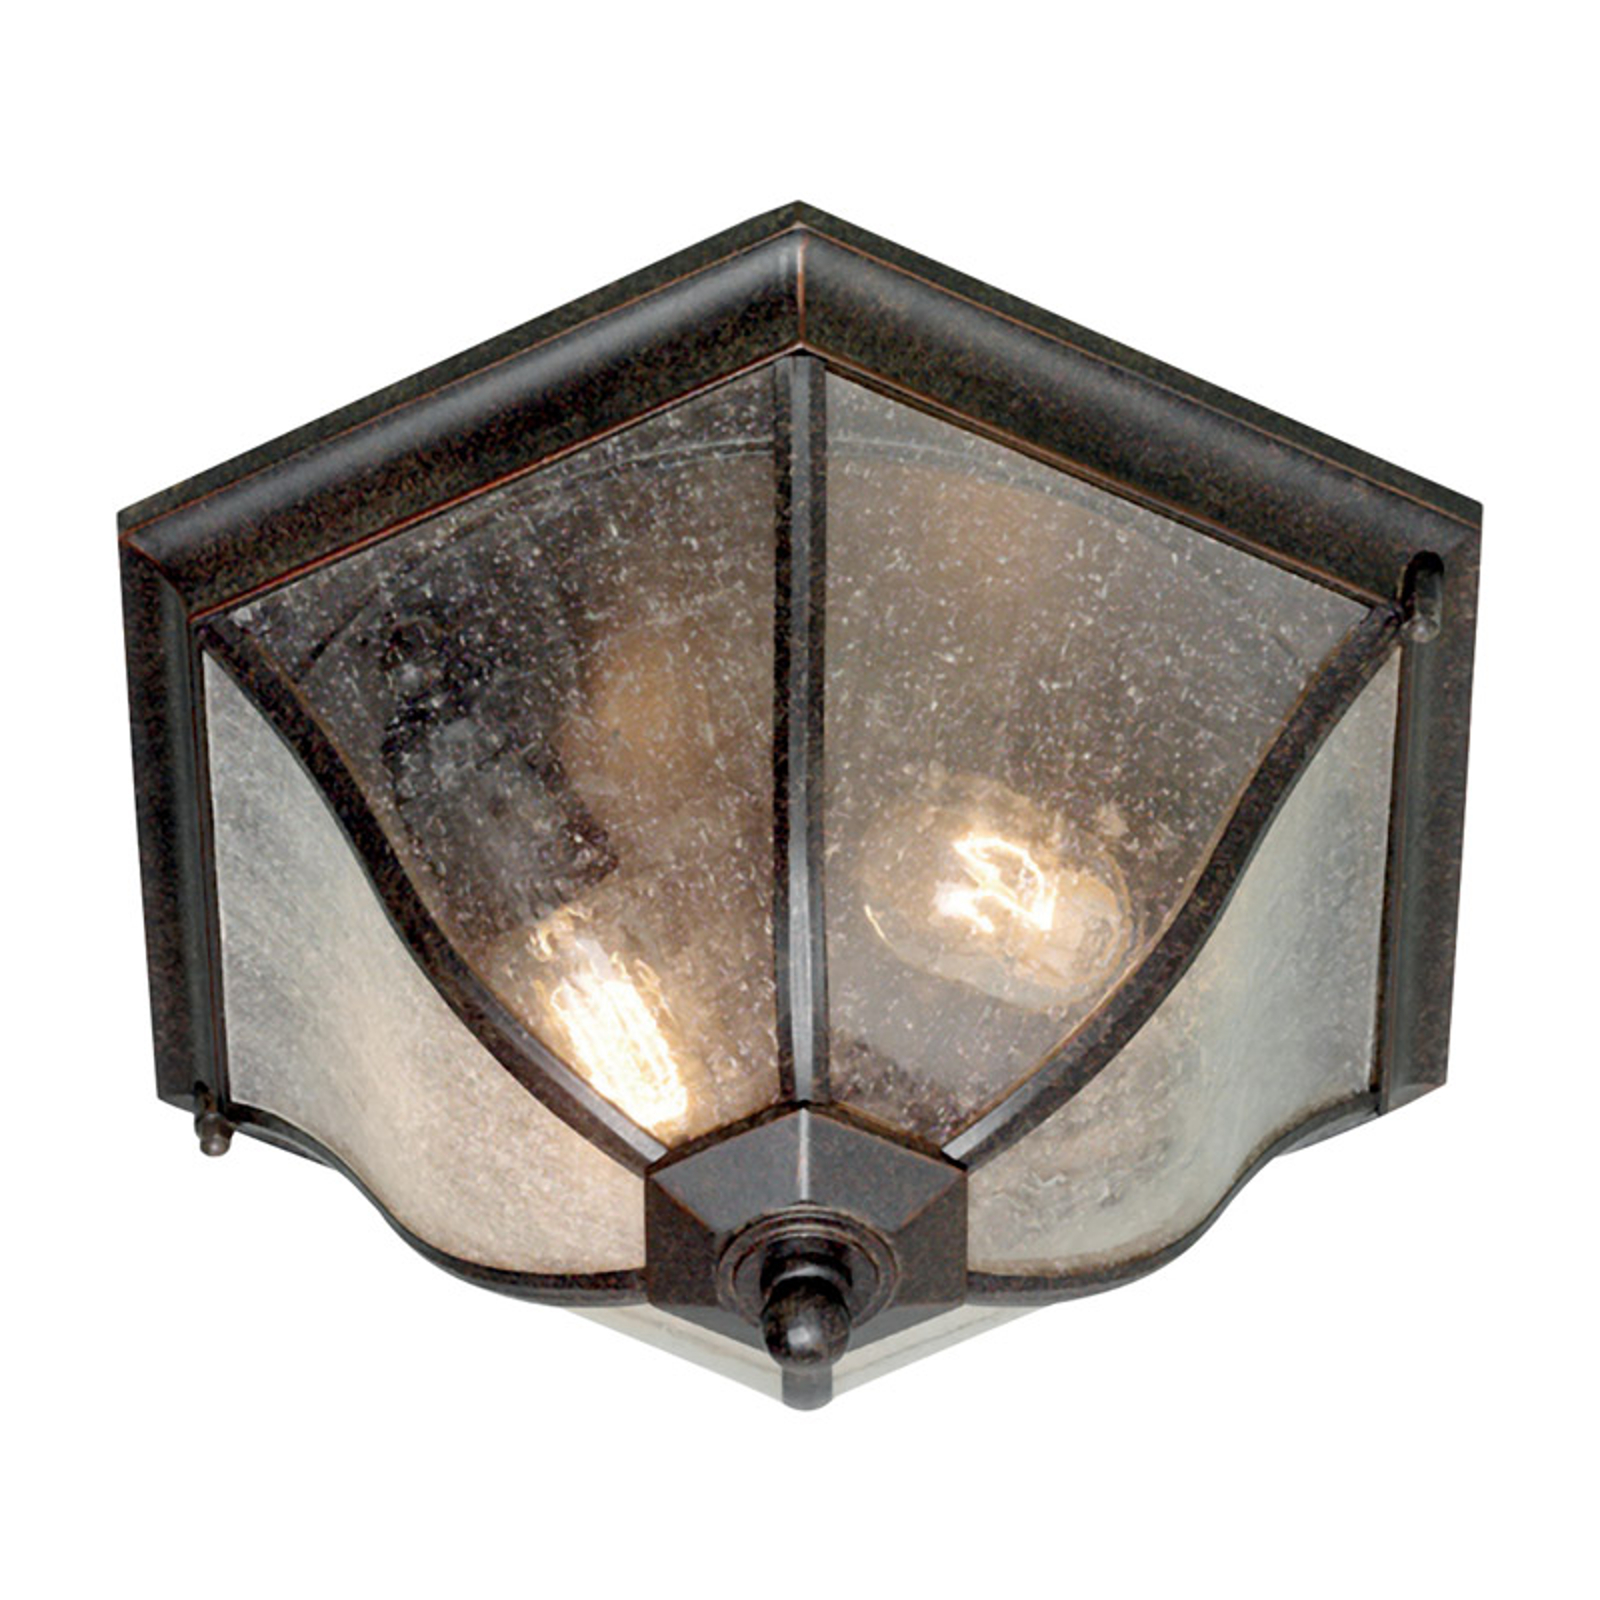 Bronskleurige buiten plafondlamp New England